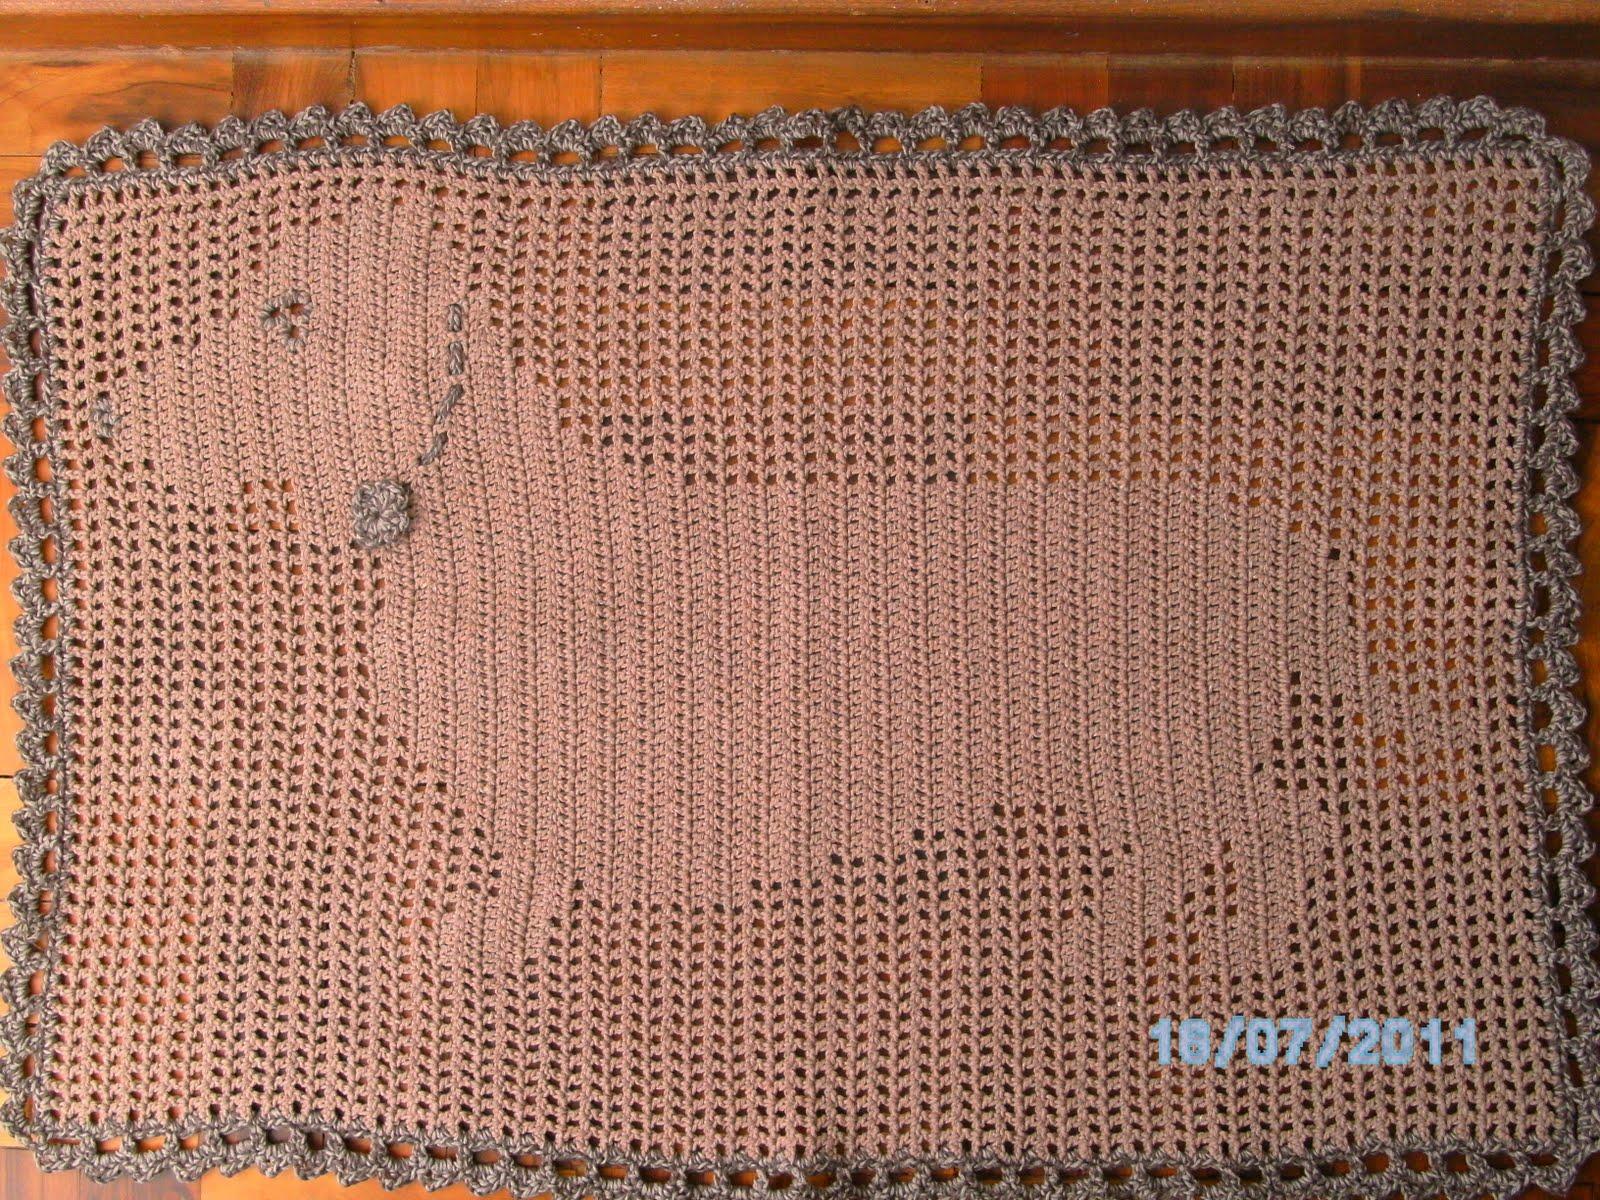 Bolsa Para Carregar Cachorro Em Croche : Tathy croche cia tapete cachorro em croch? fil?